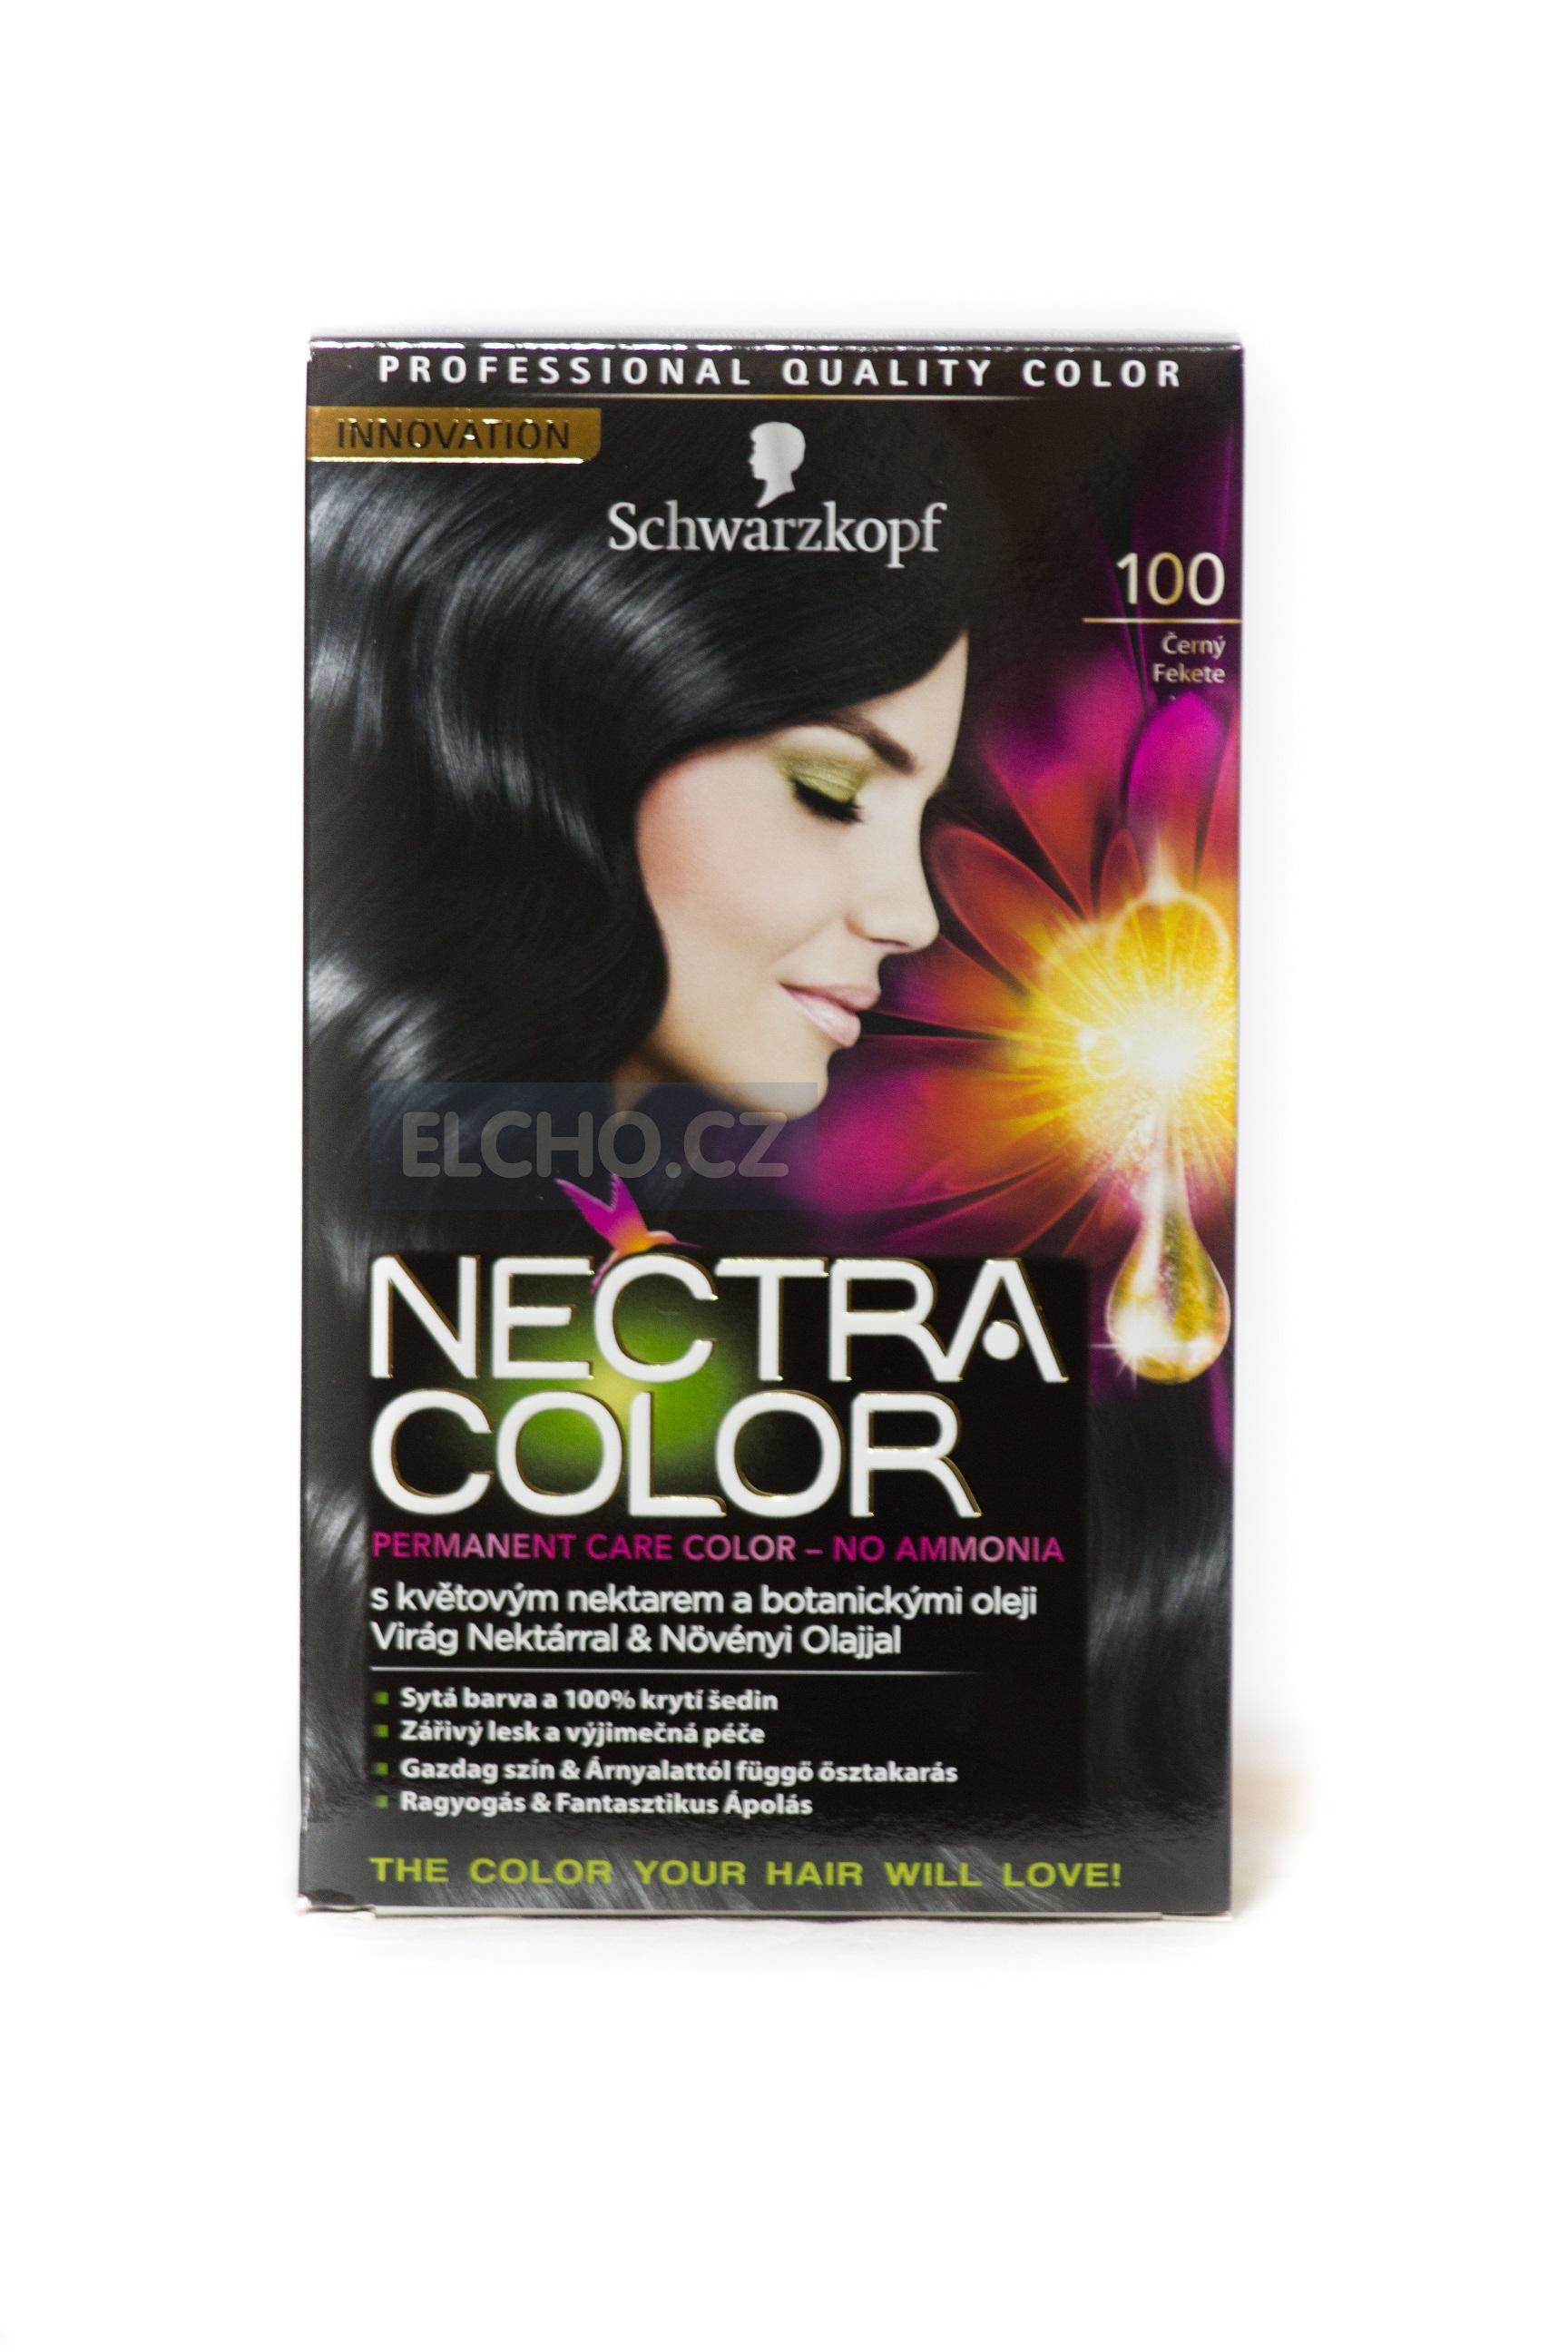 SCHWARZKOPF Nectra color 100 černý